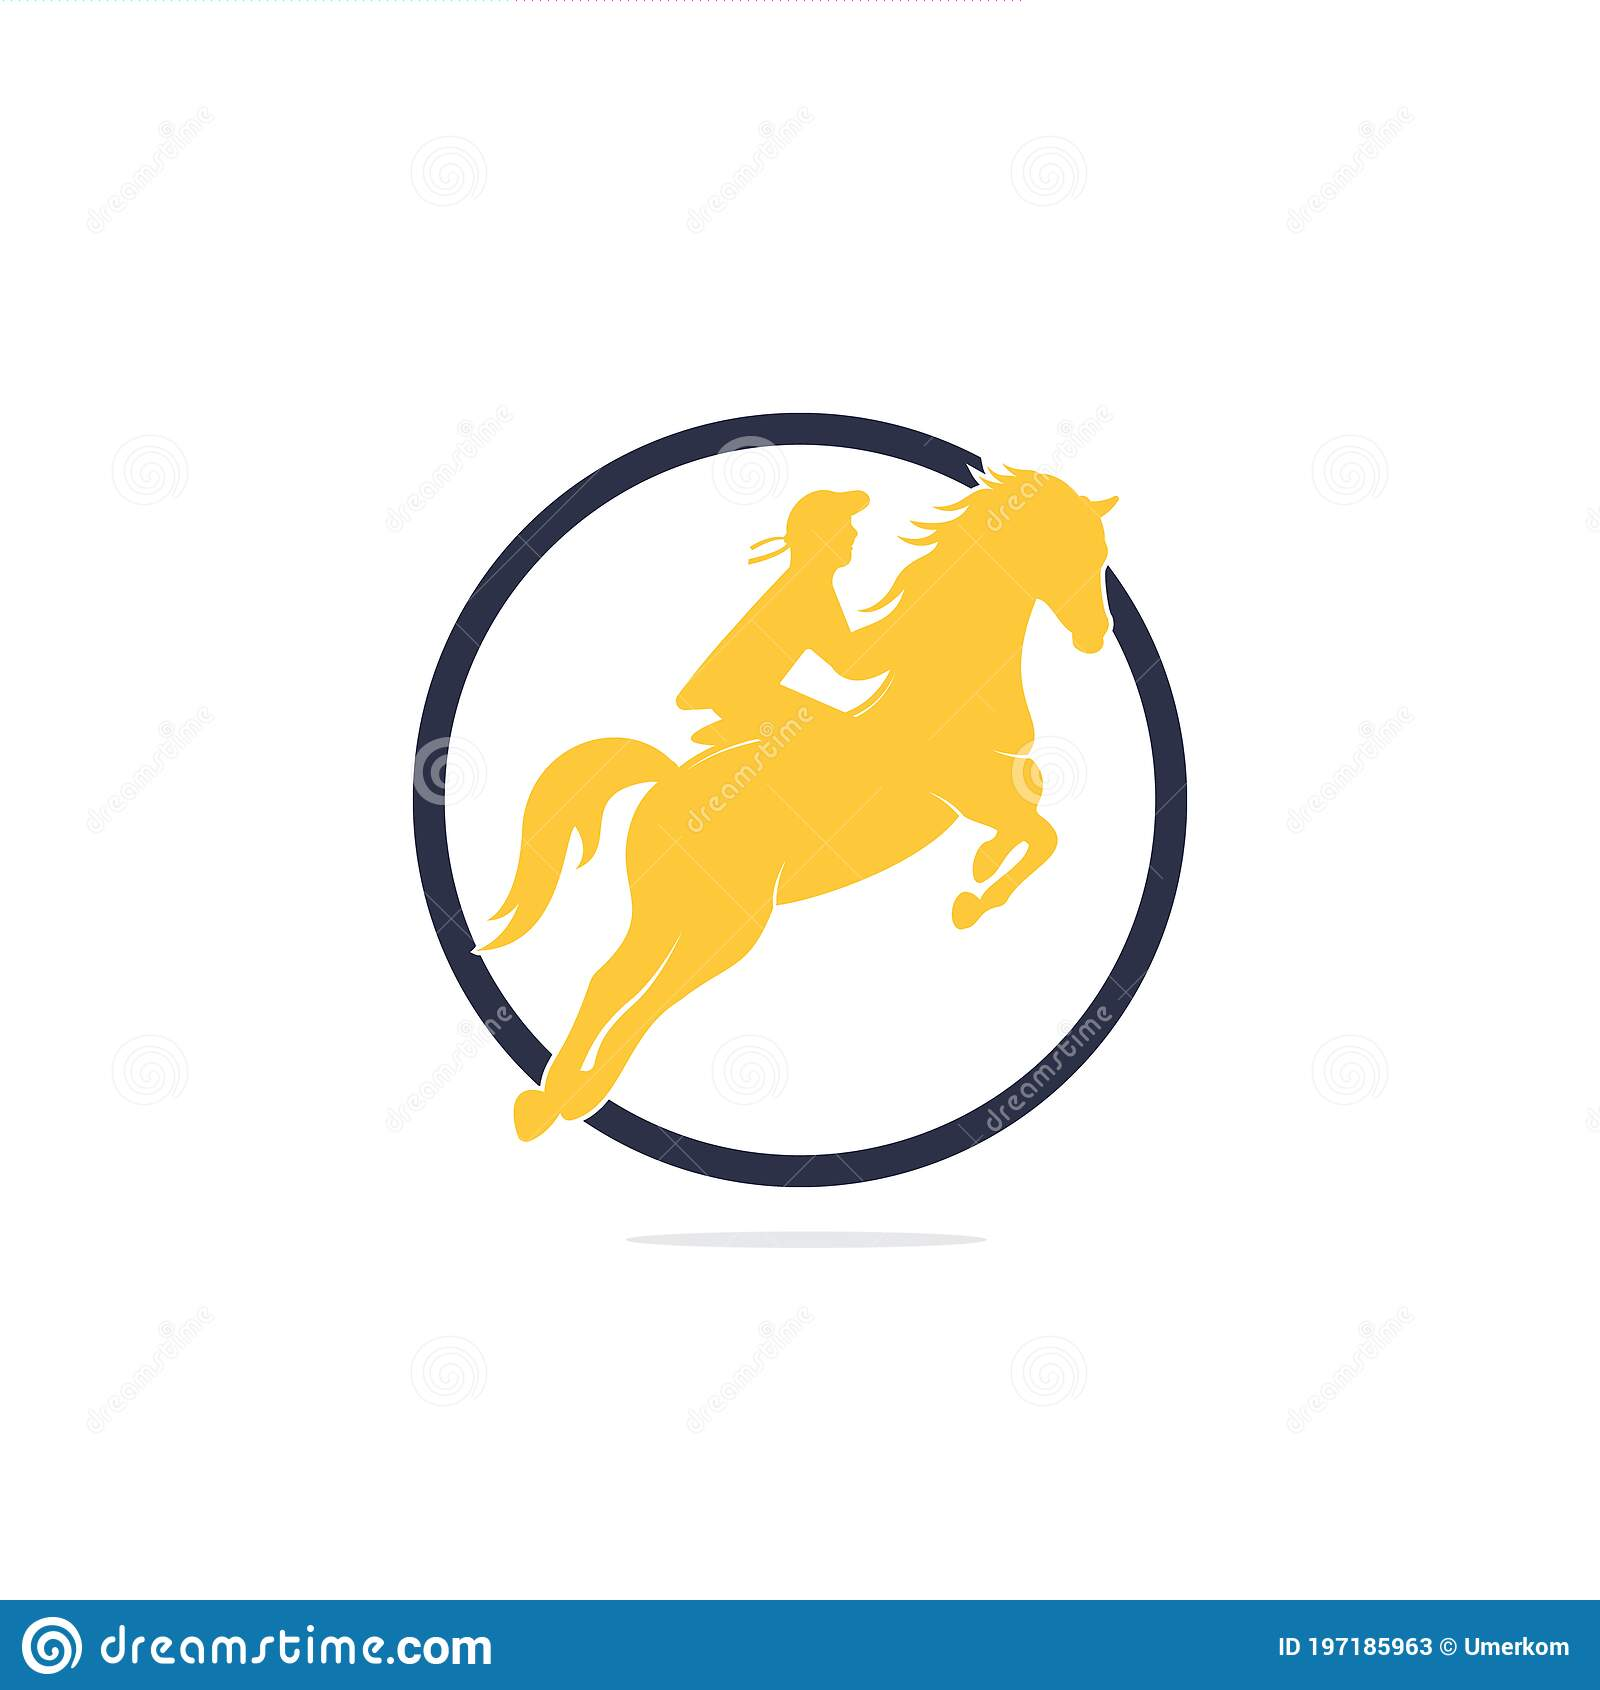 Racing Logo Design Stock Illustrations 11 745 Racing Logo Design Stock Illustrations Vectors Clipart Dreamstime